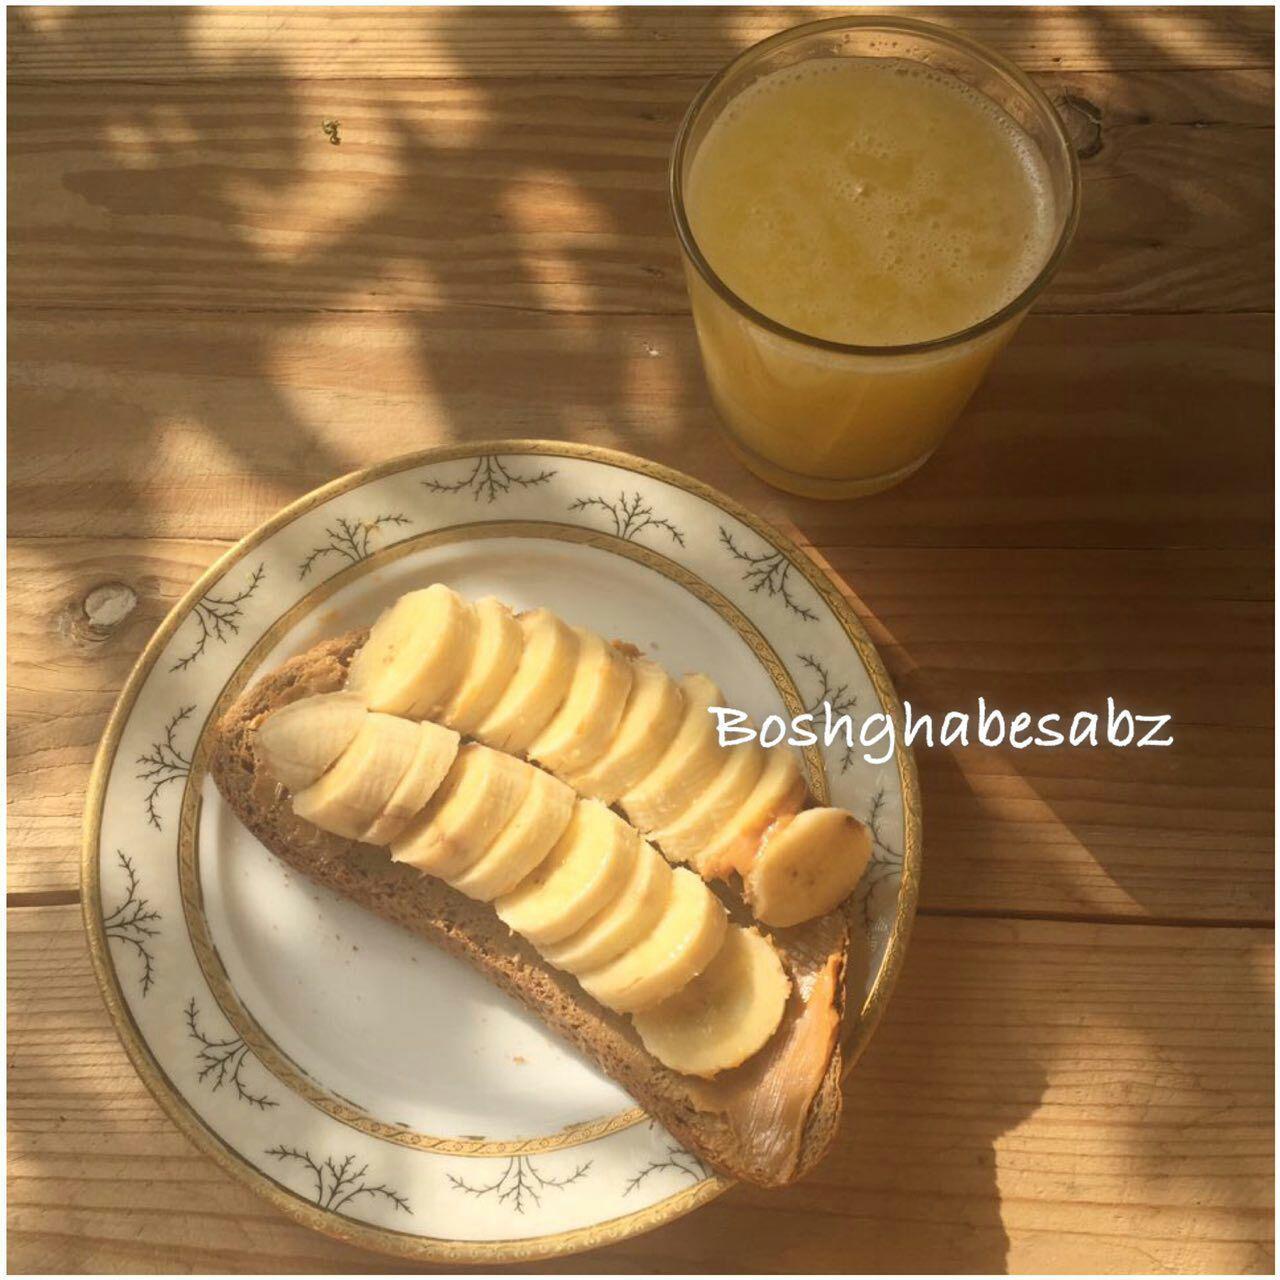 صبحانه-کره-بادام-زمینی-موز-گیاهی-وگن-وگان